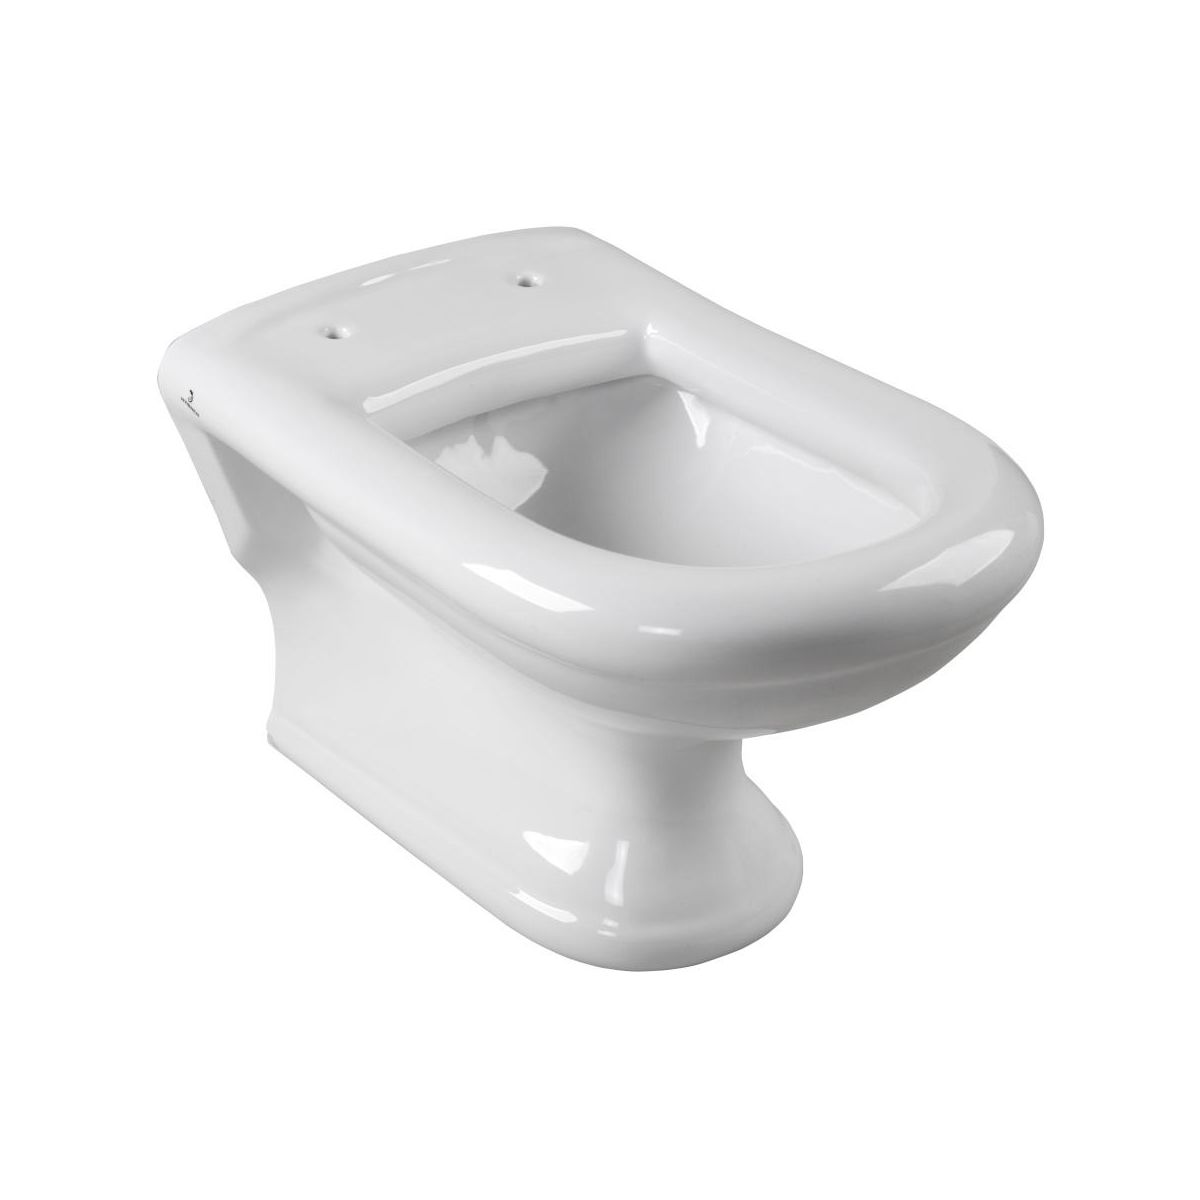 Miski sedesowe wc w sklepach leroy merlin - Wc retro leroy merlin ...